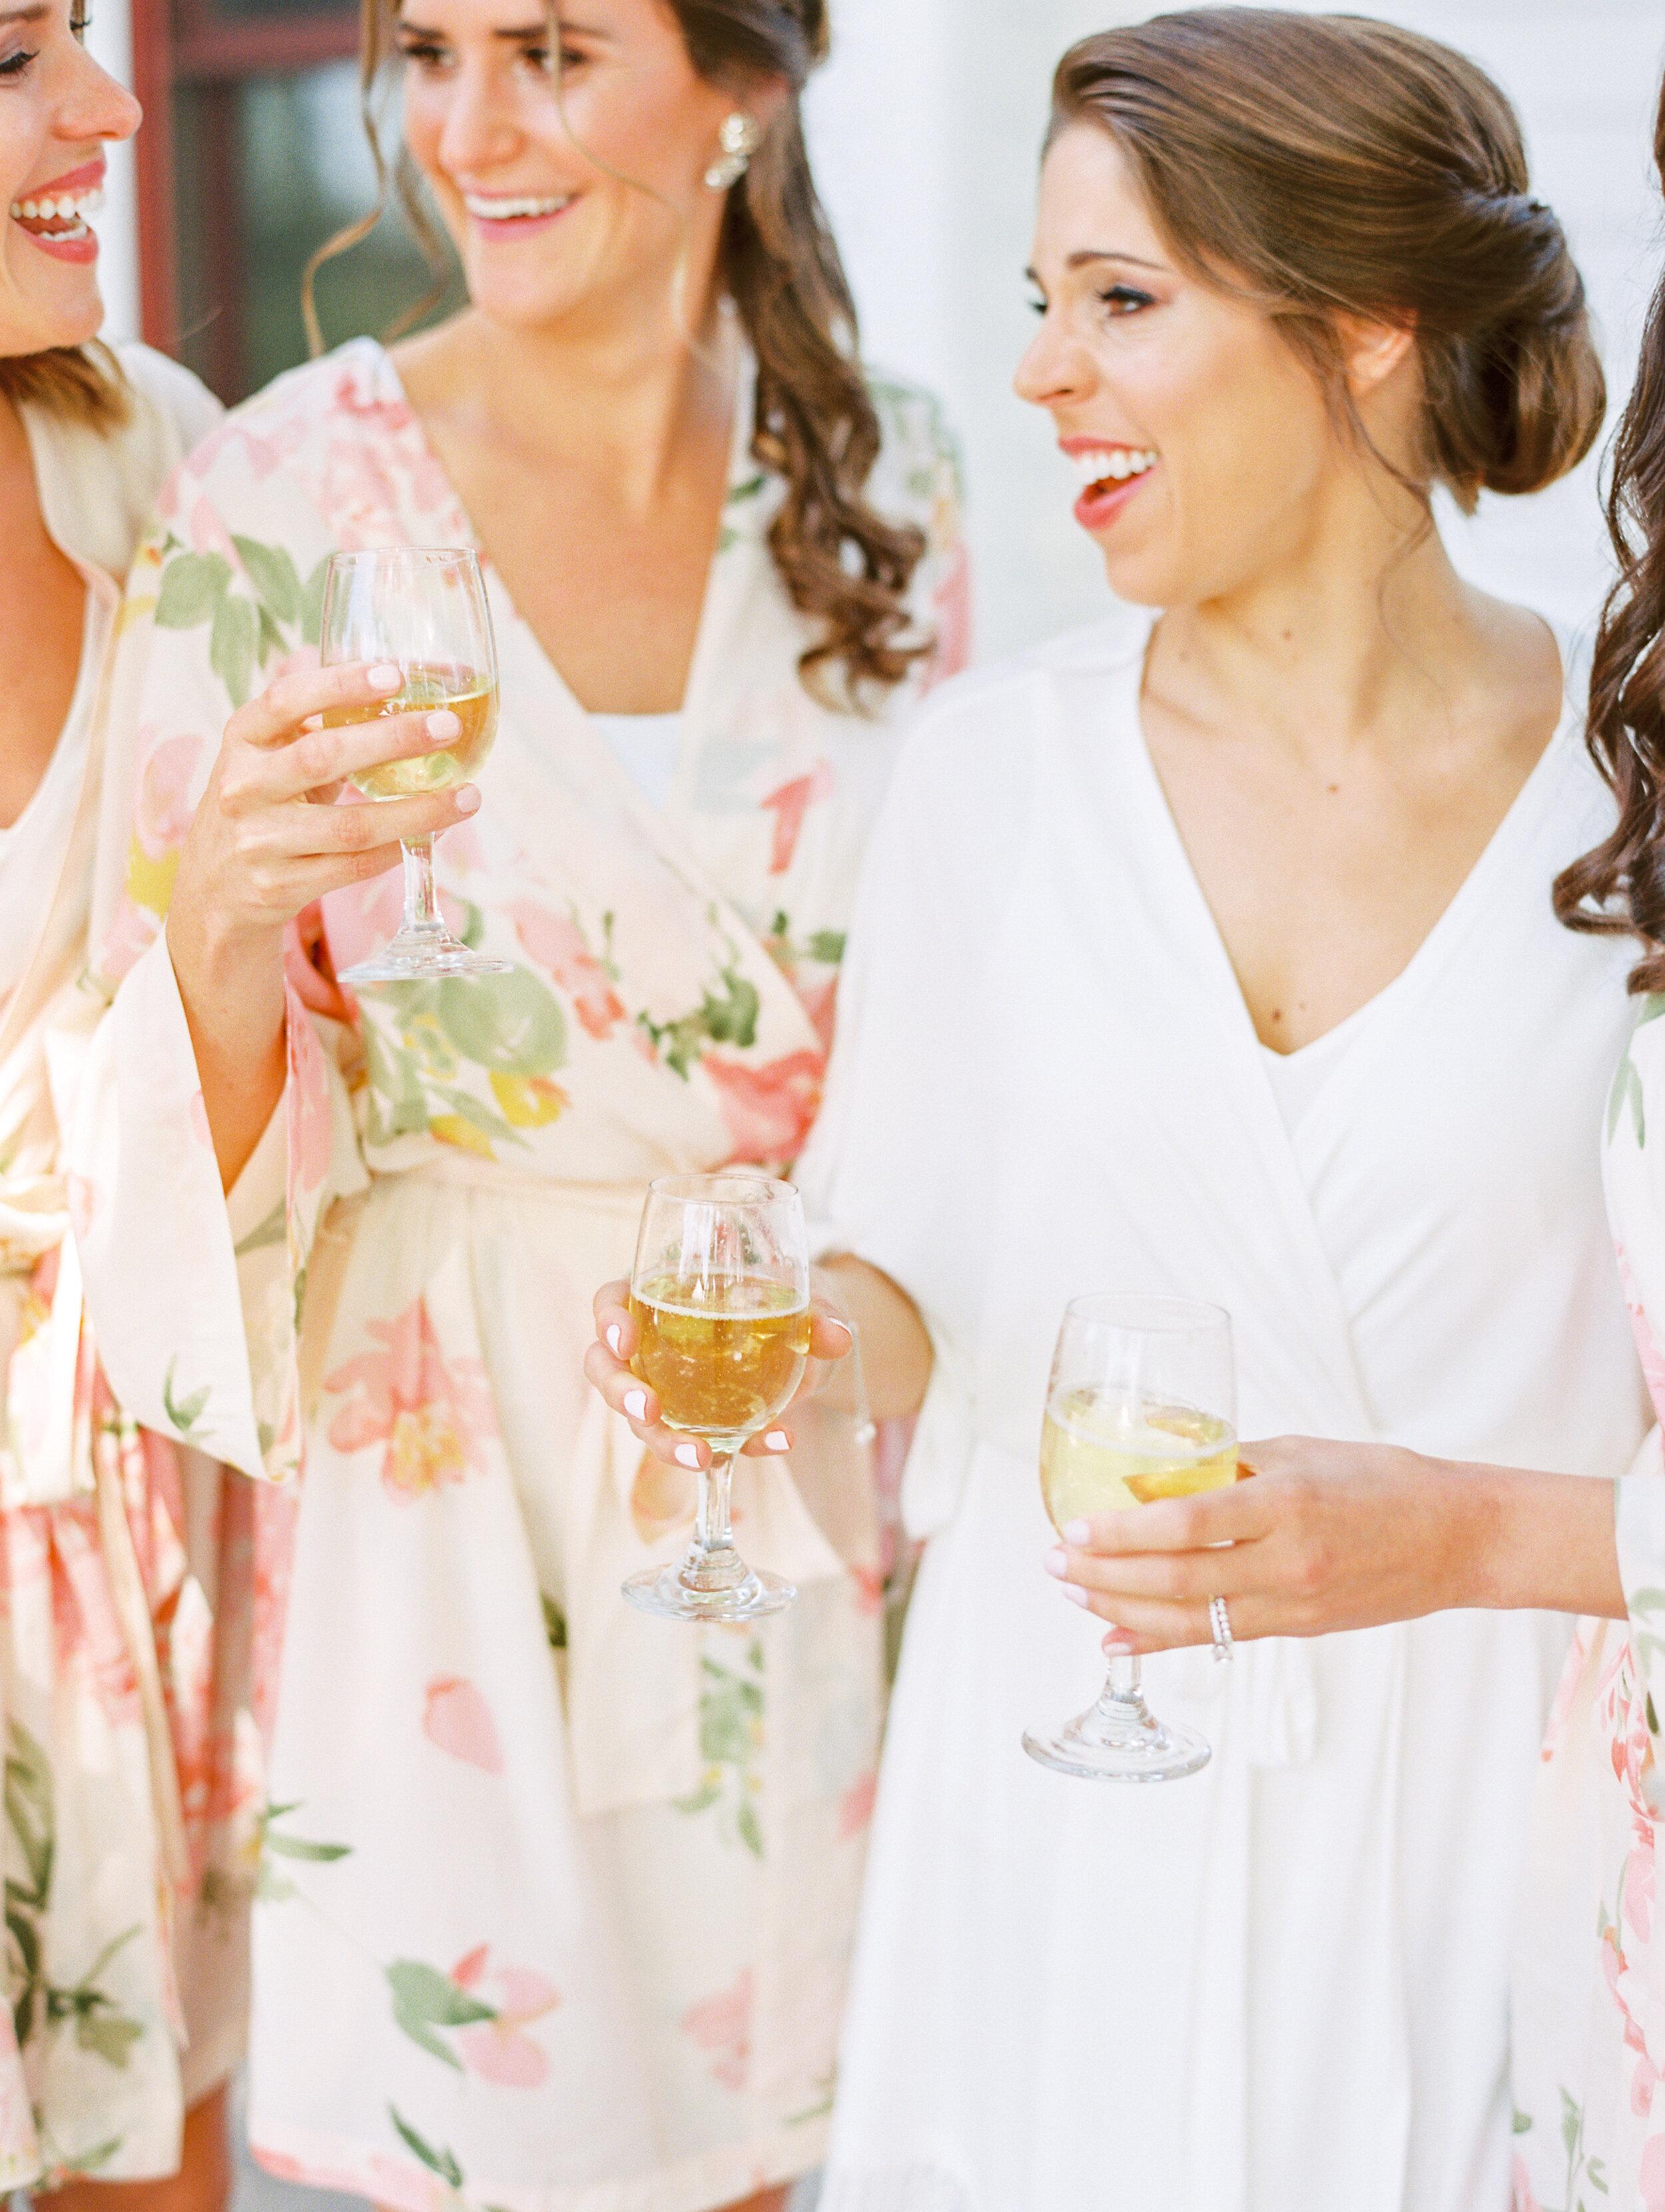 Steinlage+Wedding+Getting+Ready-53.jpg